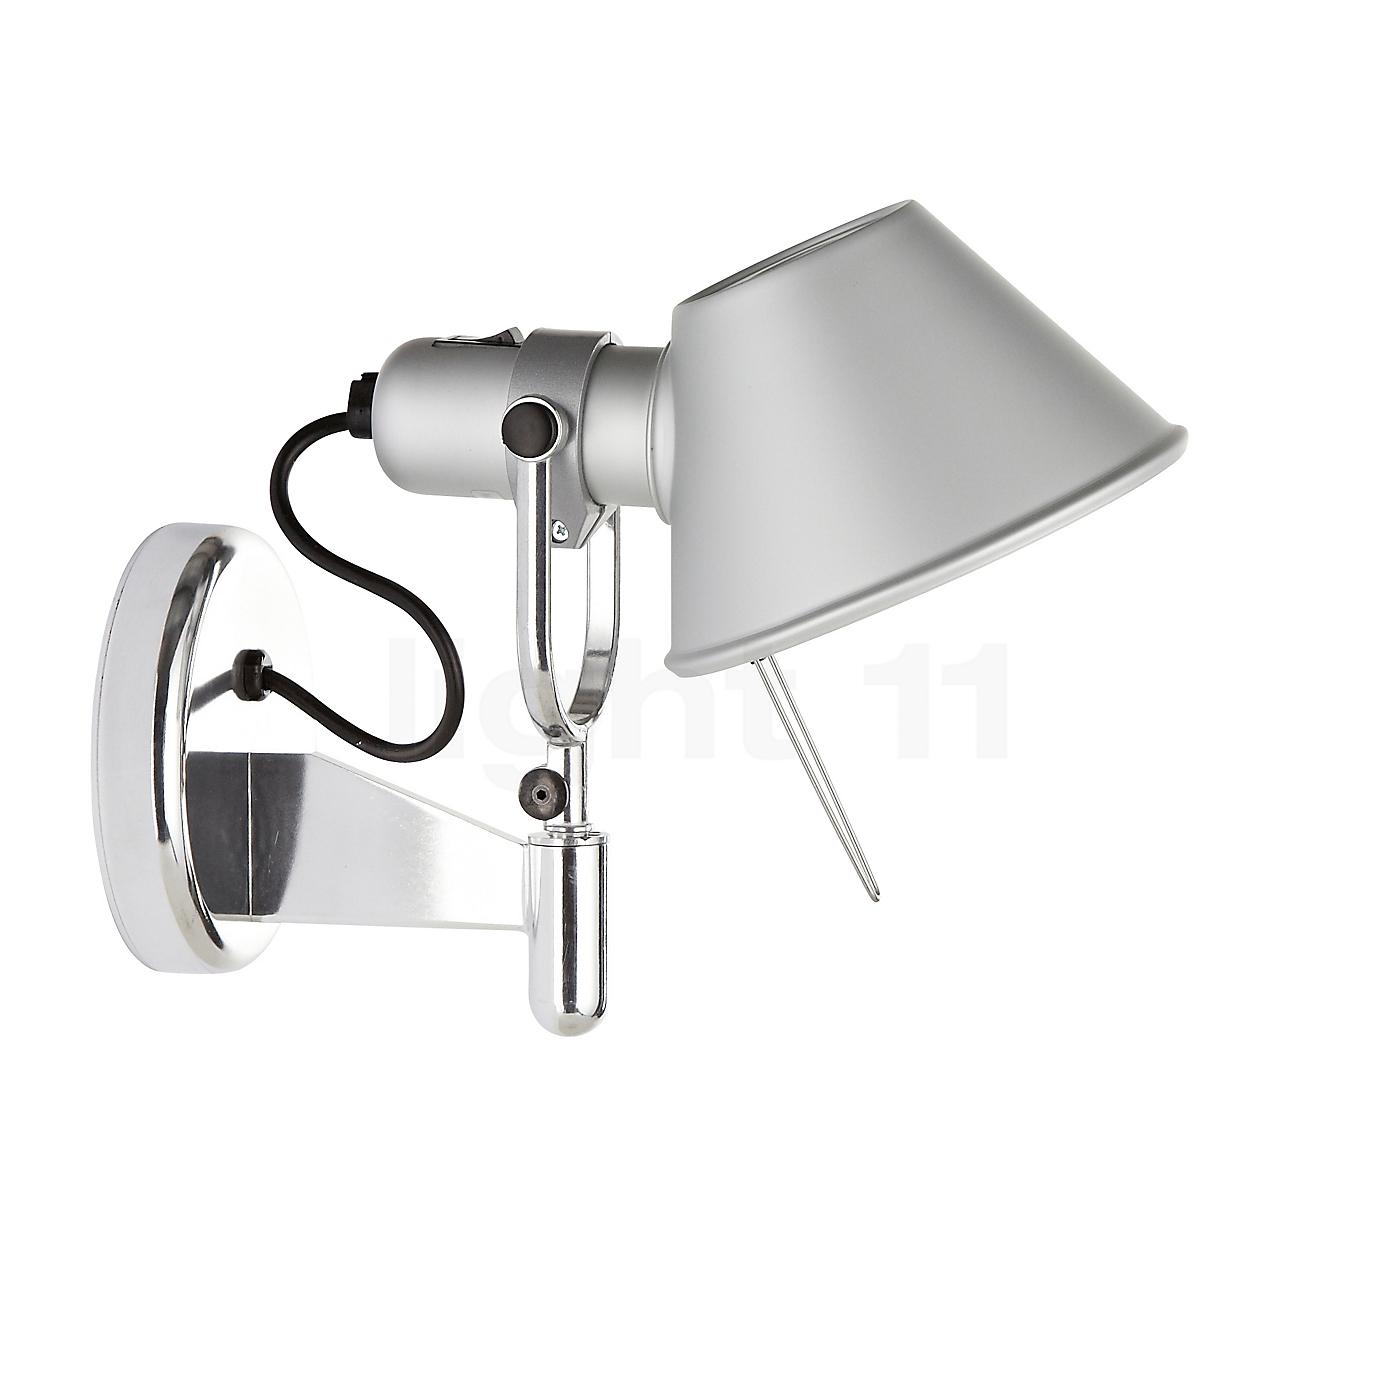 artemide tolomeo faretto wandlampen lampen verlichting. Black Bedroom Furniture Sets. Home Design Ideas